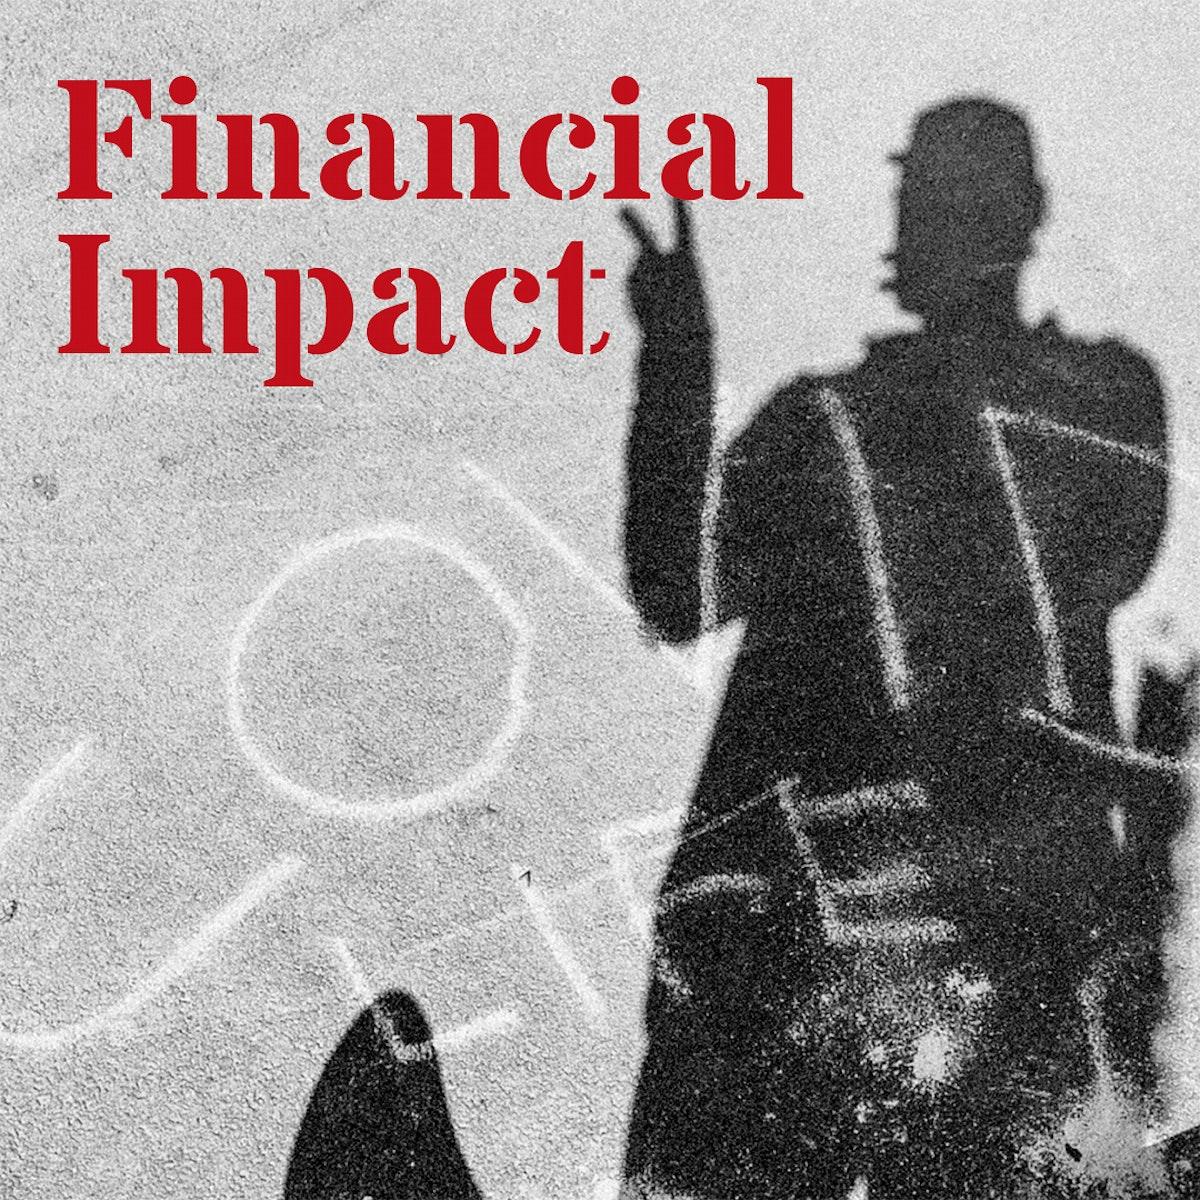 COVID-19 financial impact social banner template mockup